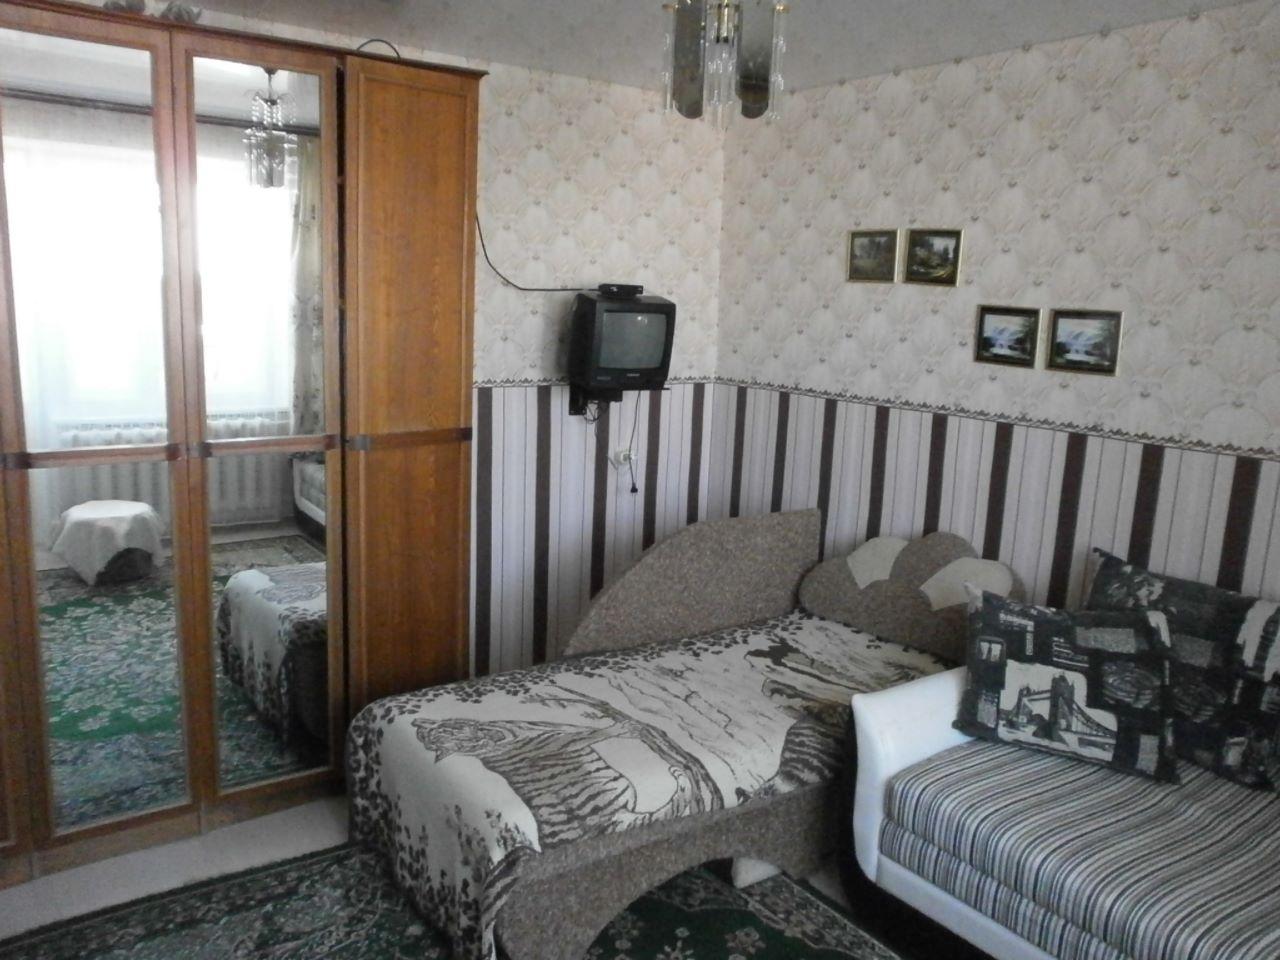 Продается 1-комнатная квартира на ул. Парковая — 36 000 у.е. (фото №2)